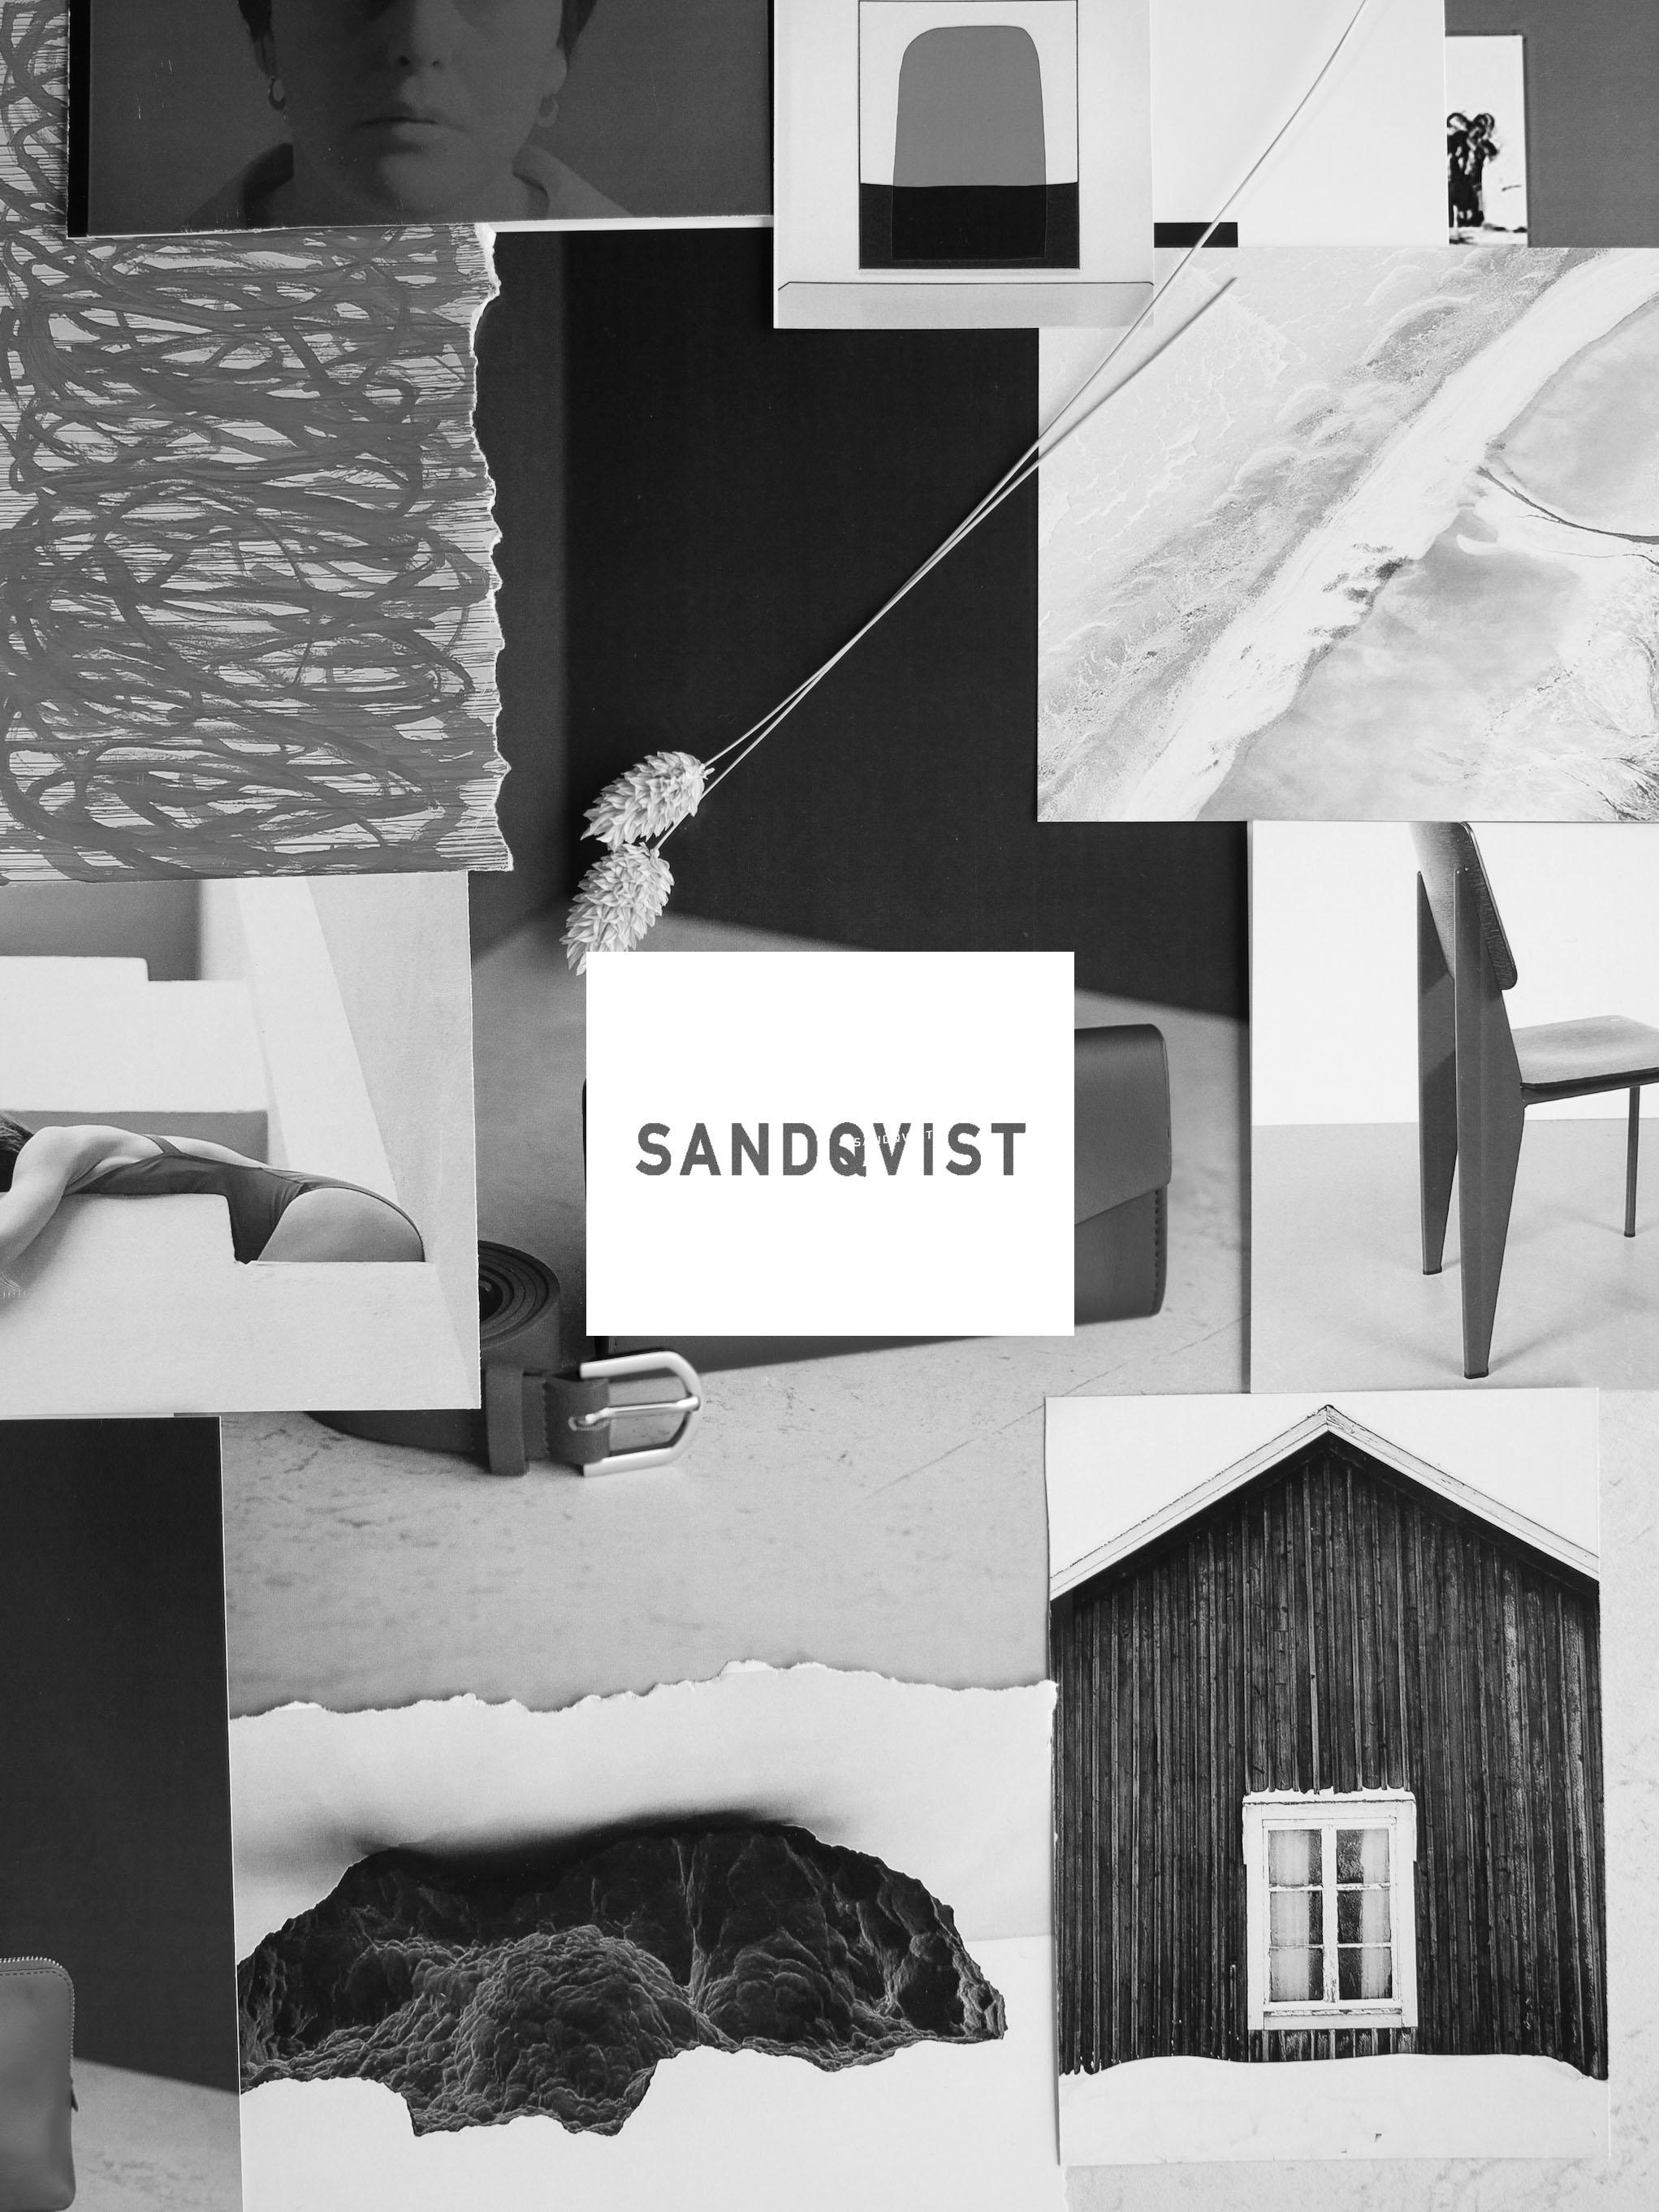 sandqvist_aw19_teaser1 copy.jpg